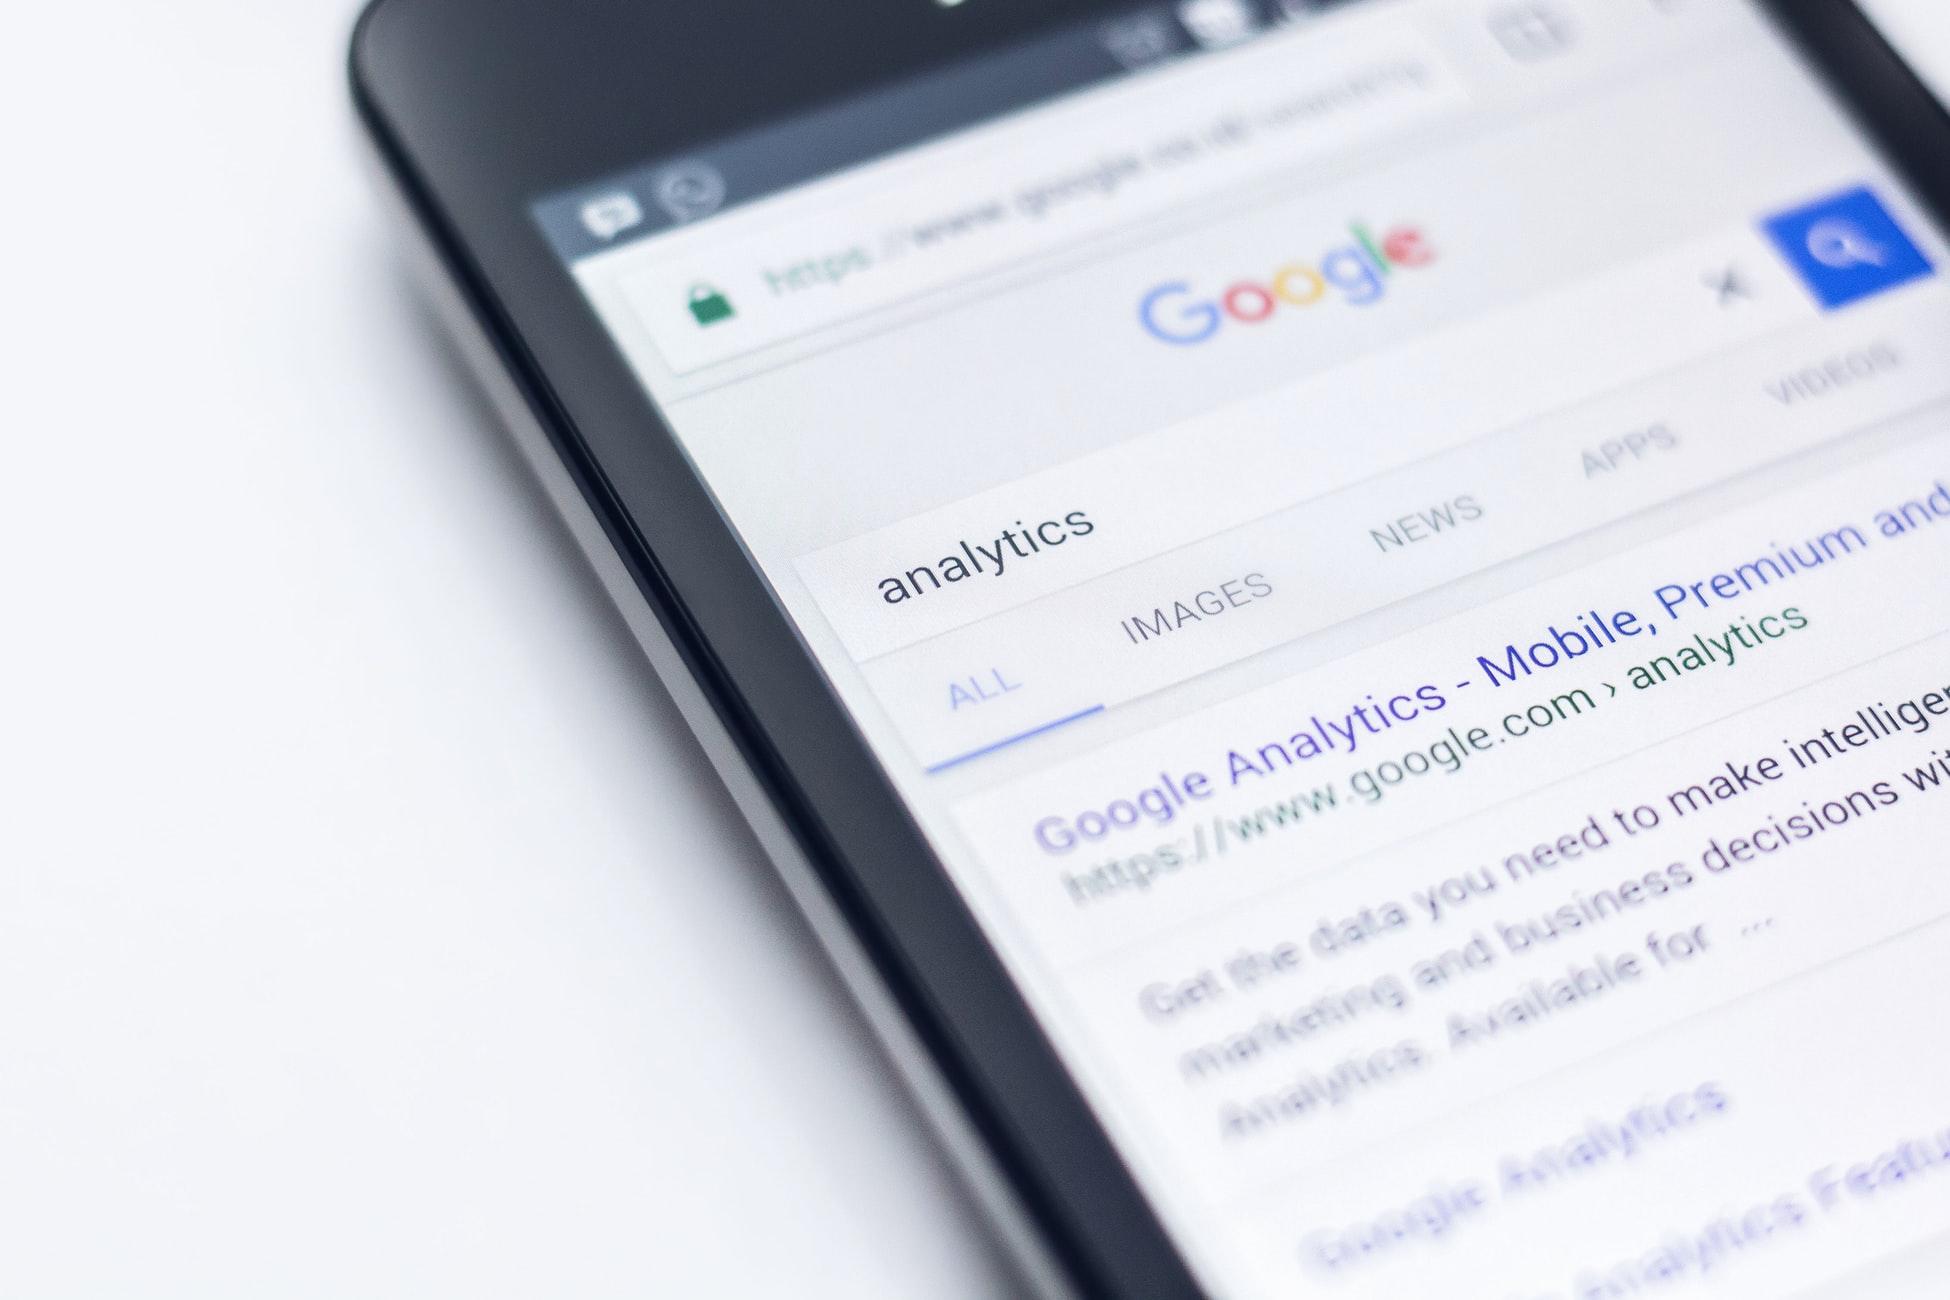 search in Google seo teksten schrijven